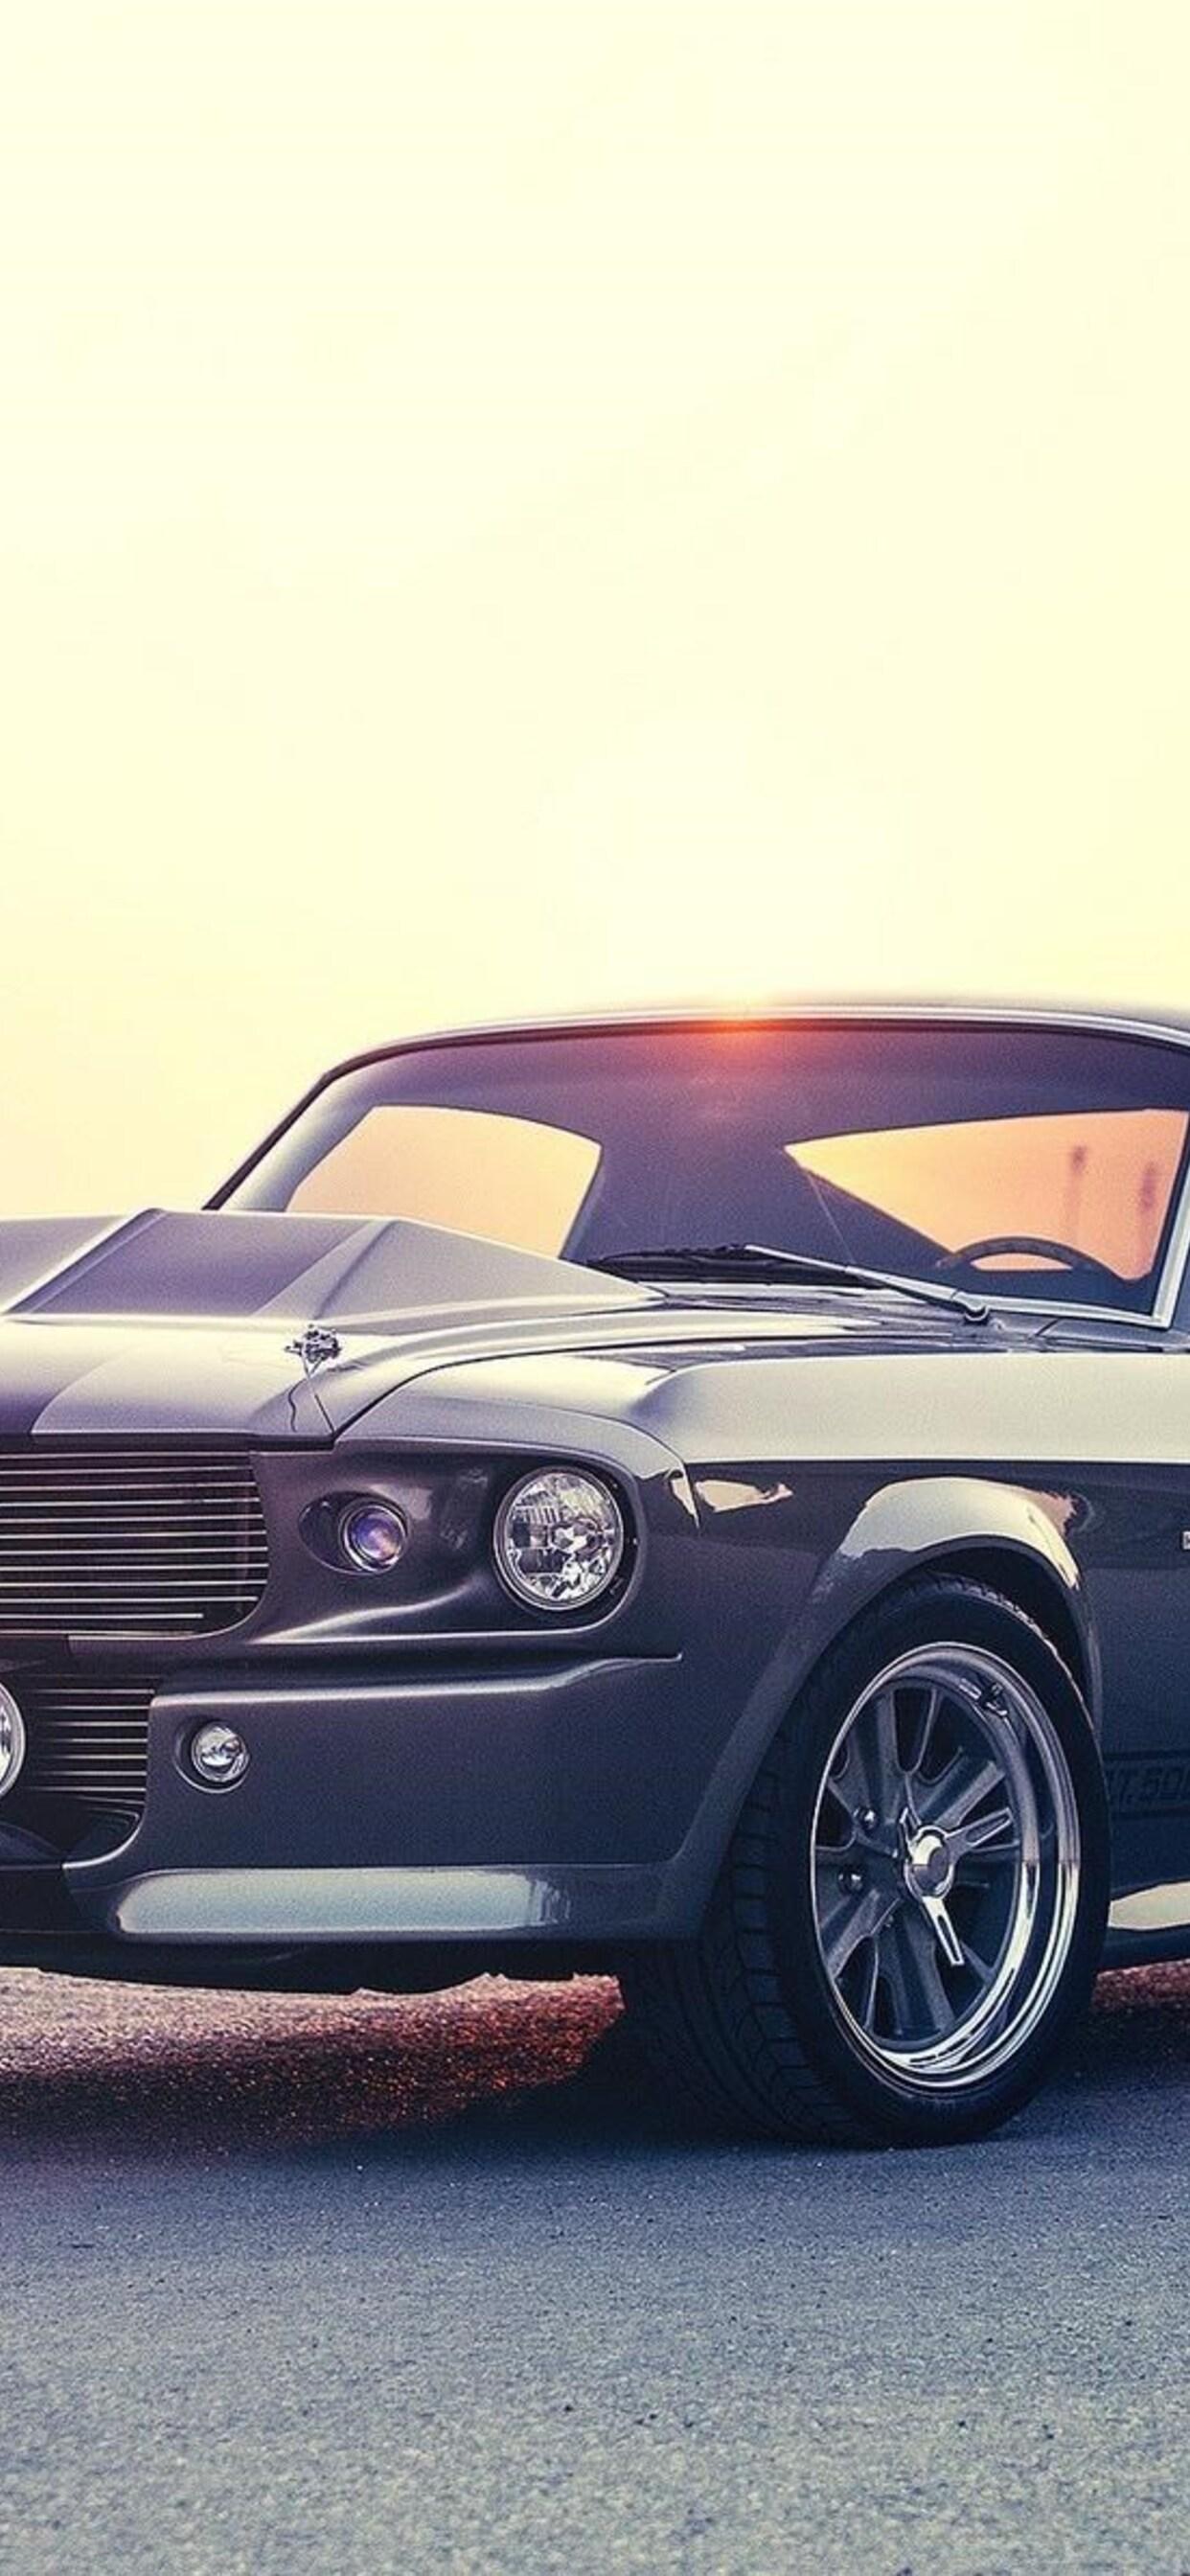 Ford Mustang Muscle Car Wallpaper Jpg